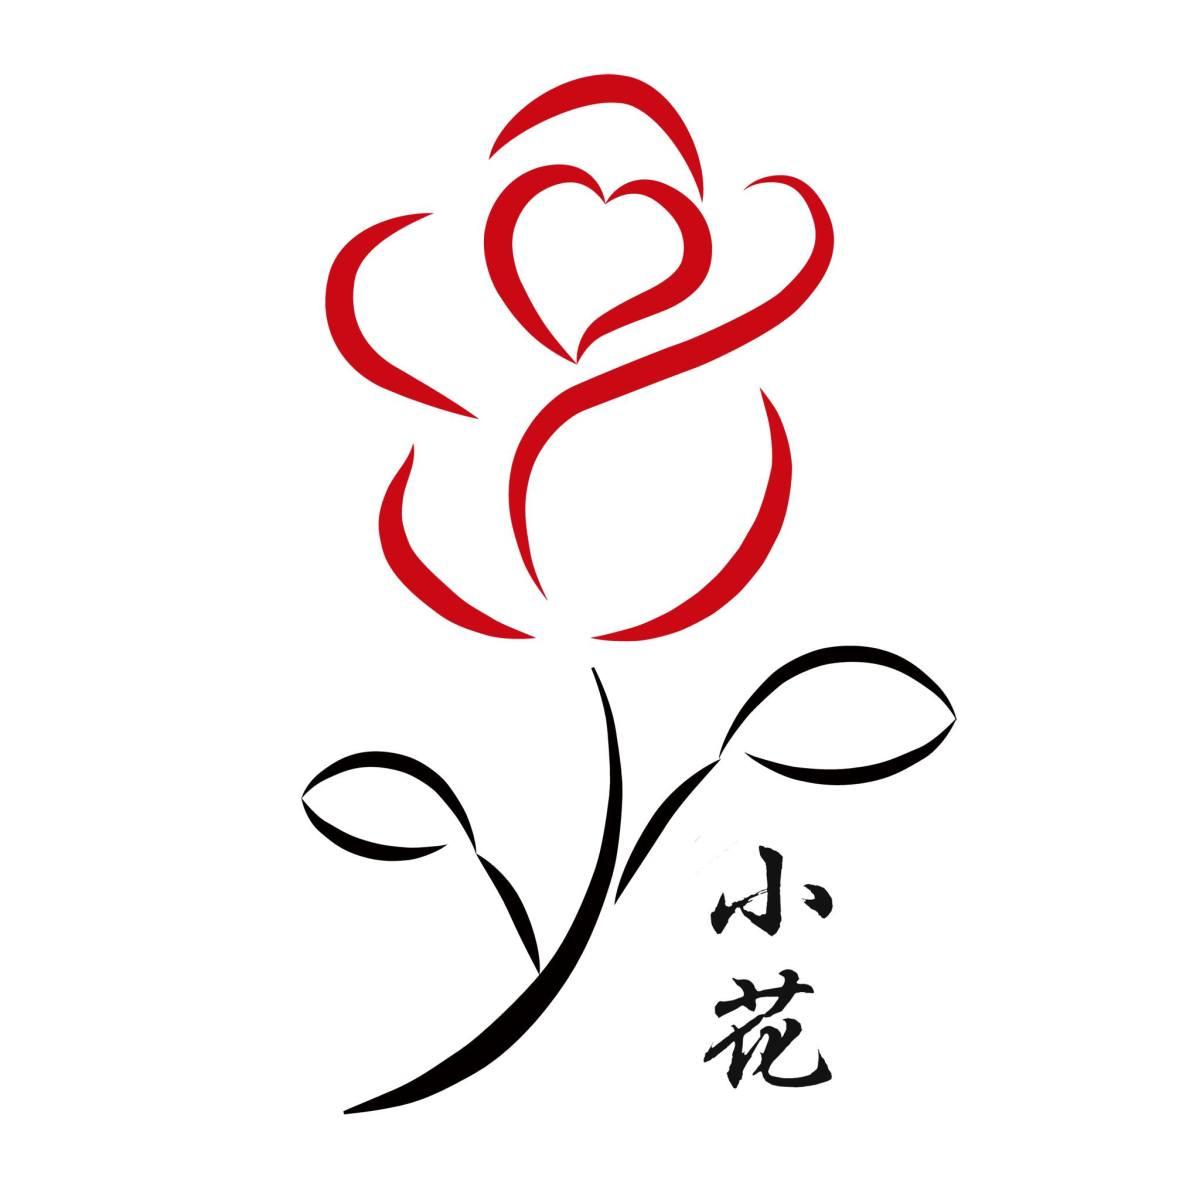 Pro-life spotlight #1: China Little Flower